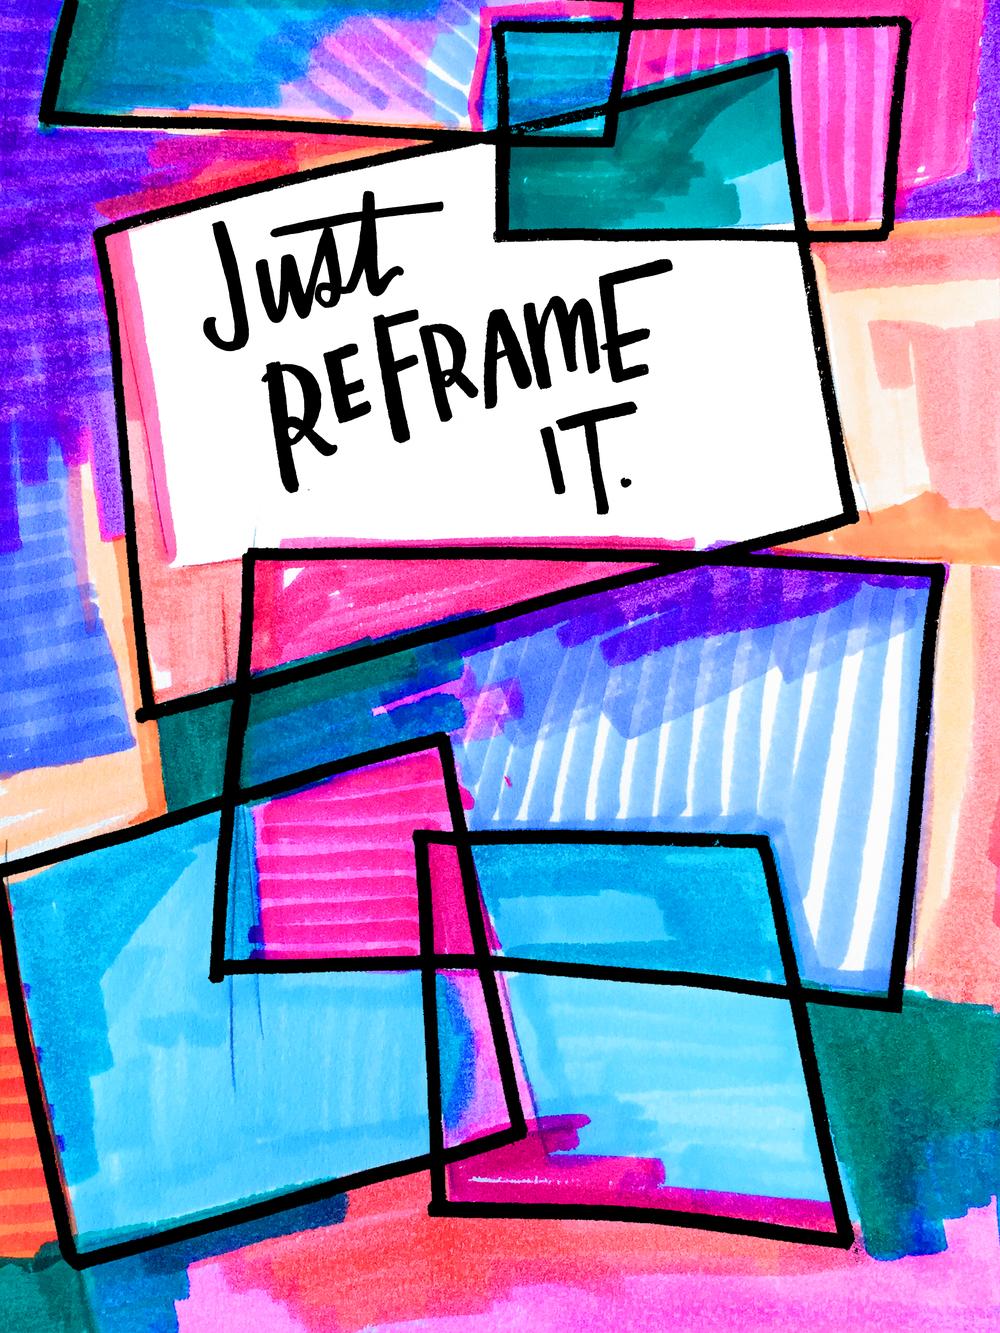 2.2_Reframe.jpg